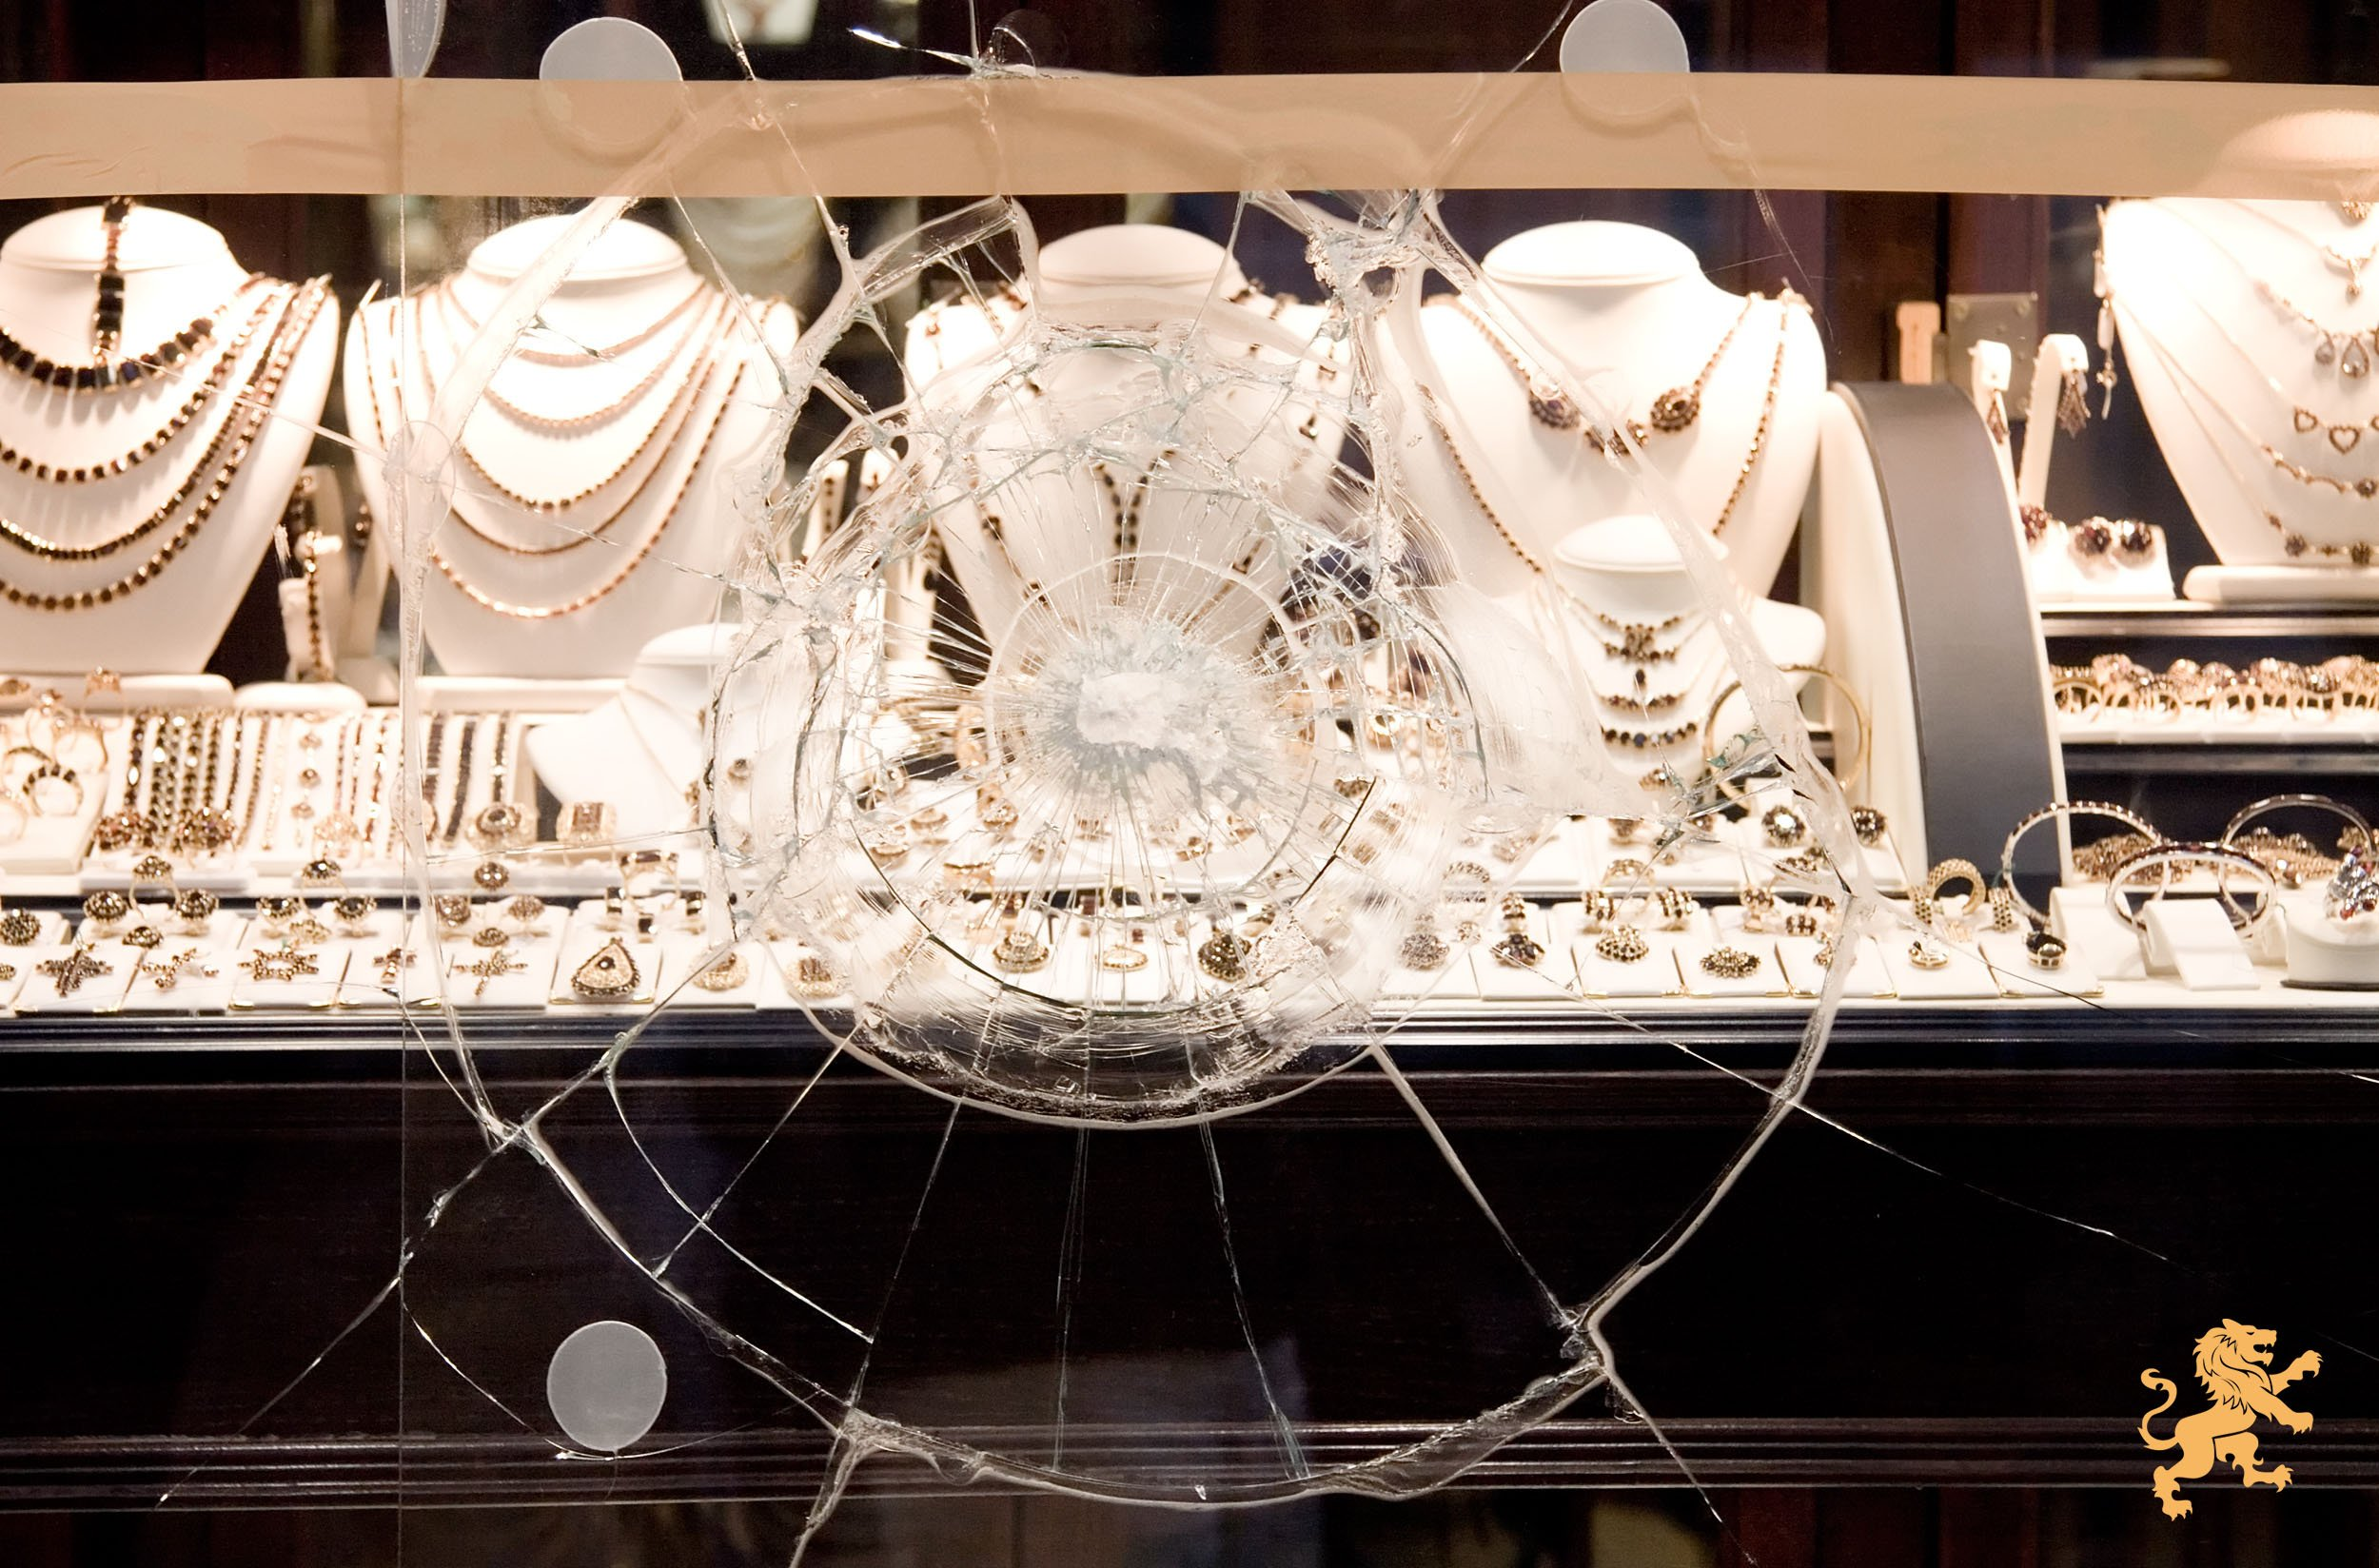 Jewelery Store Vandalism